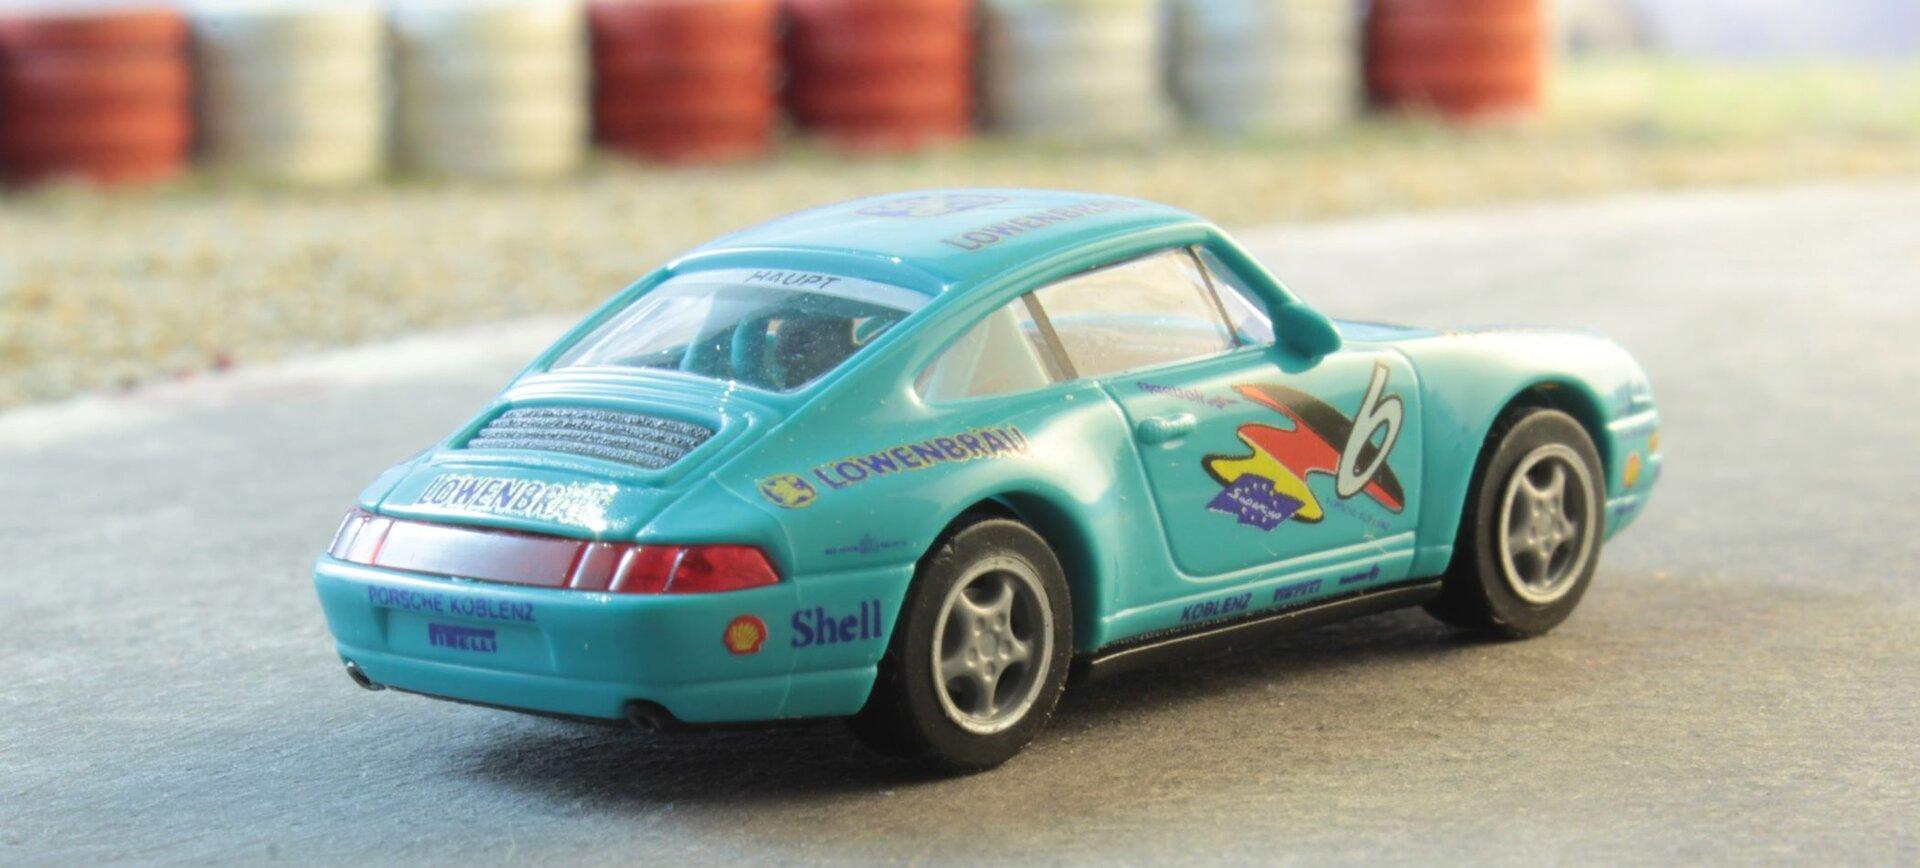 Porsche 911 Koblenz nr6 Euromodel 1 .JPG